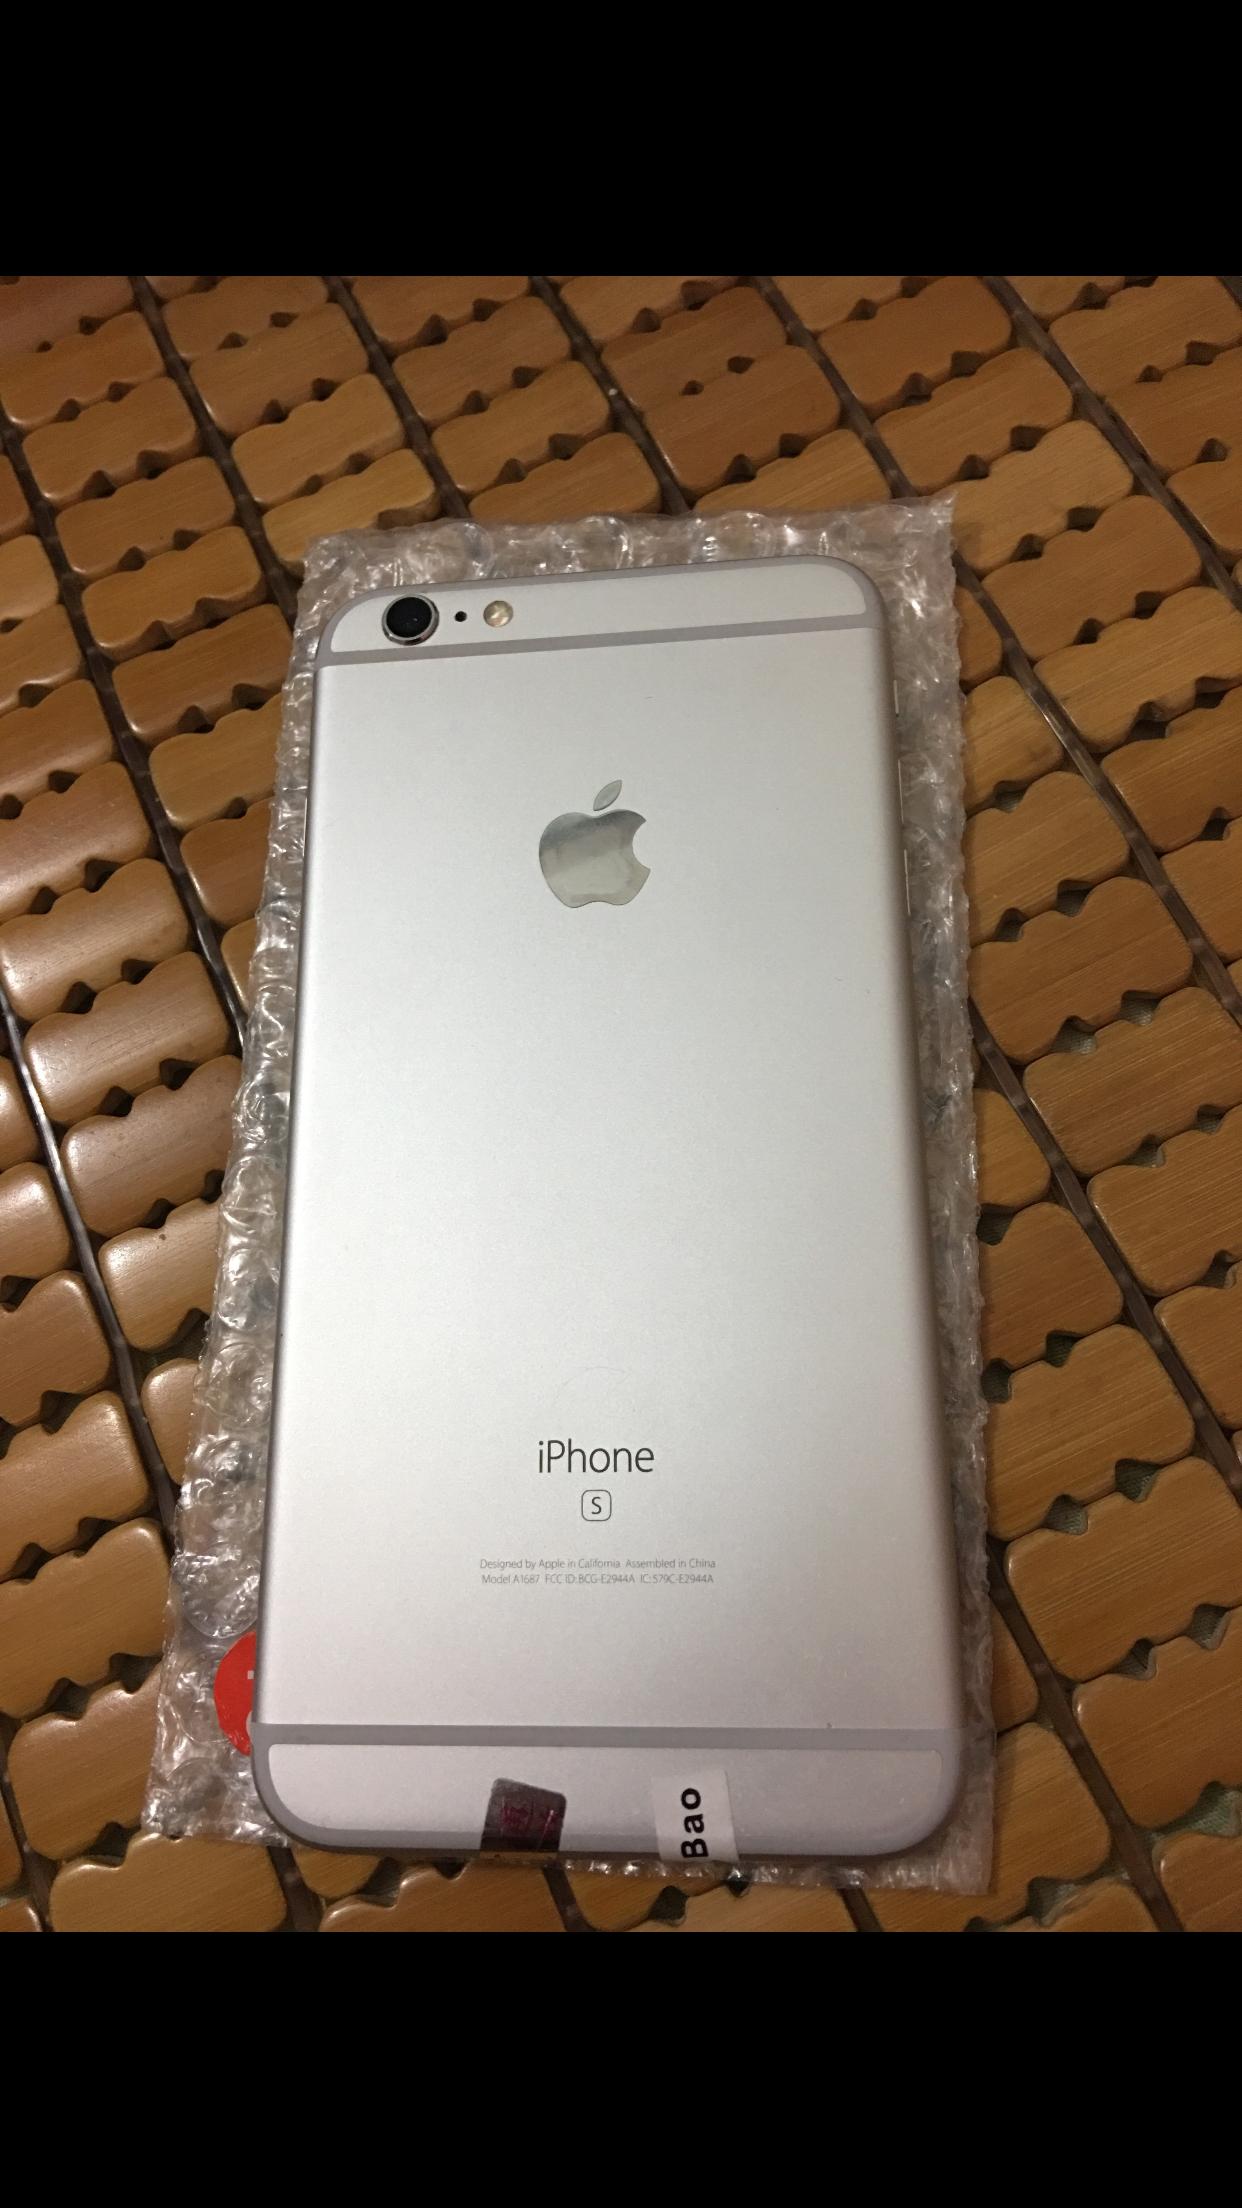 2 Cần bán 1 cặp Iphone 6s plus 16gb 99%